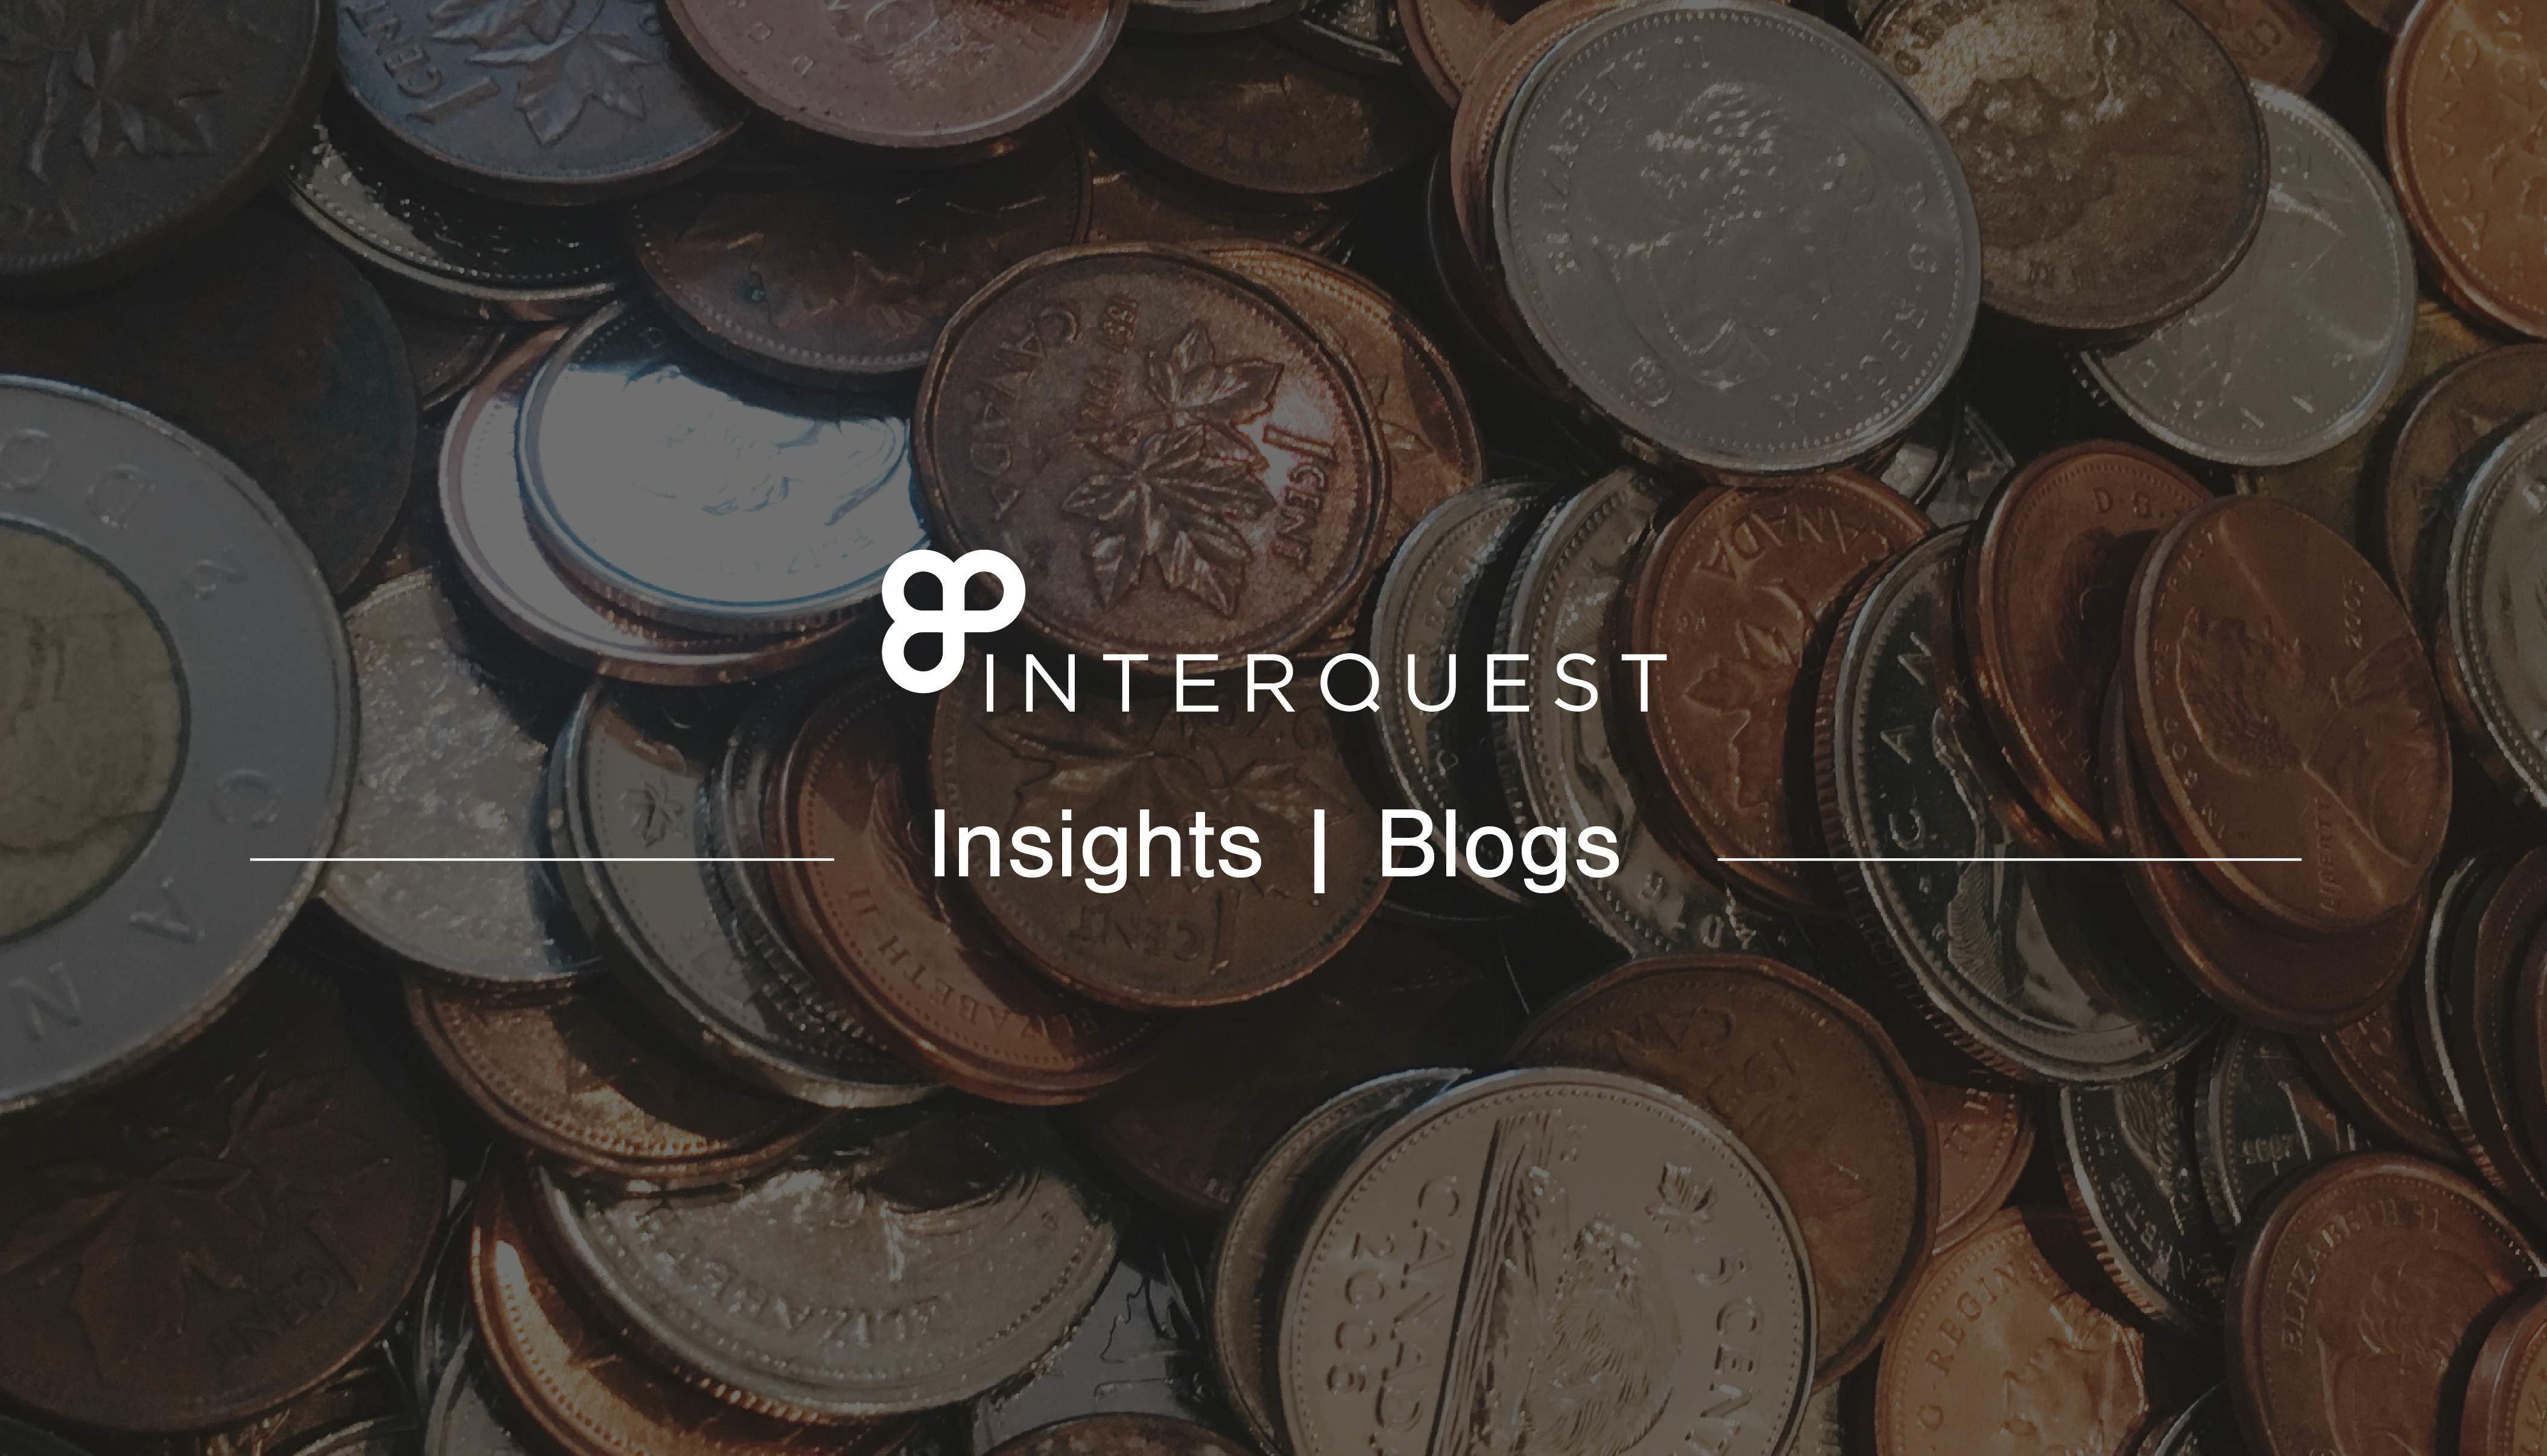 Inter Quest Insights Blogs banner